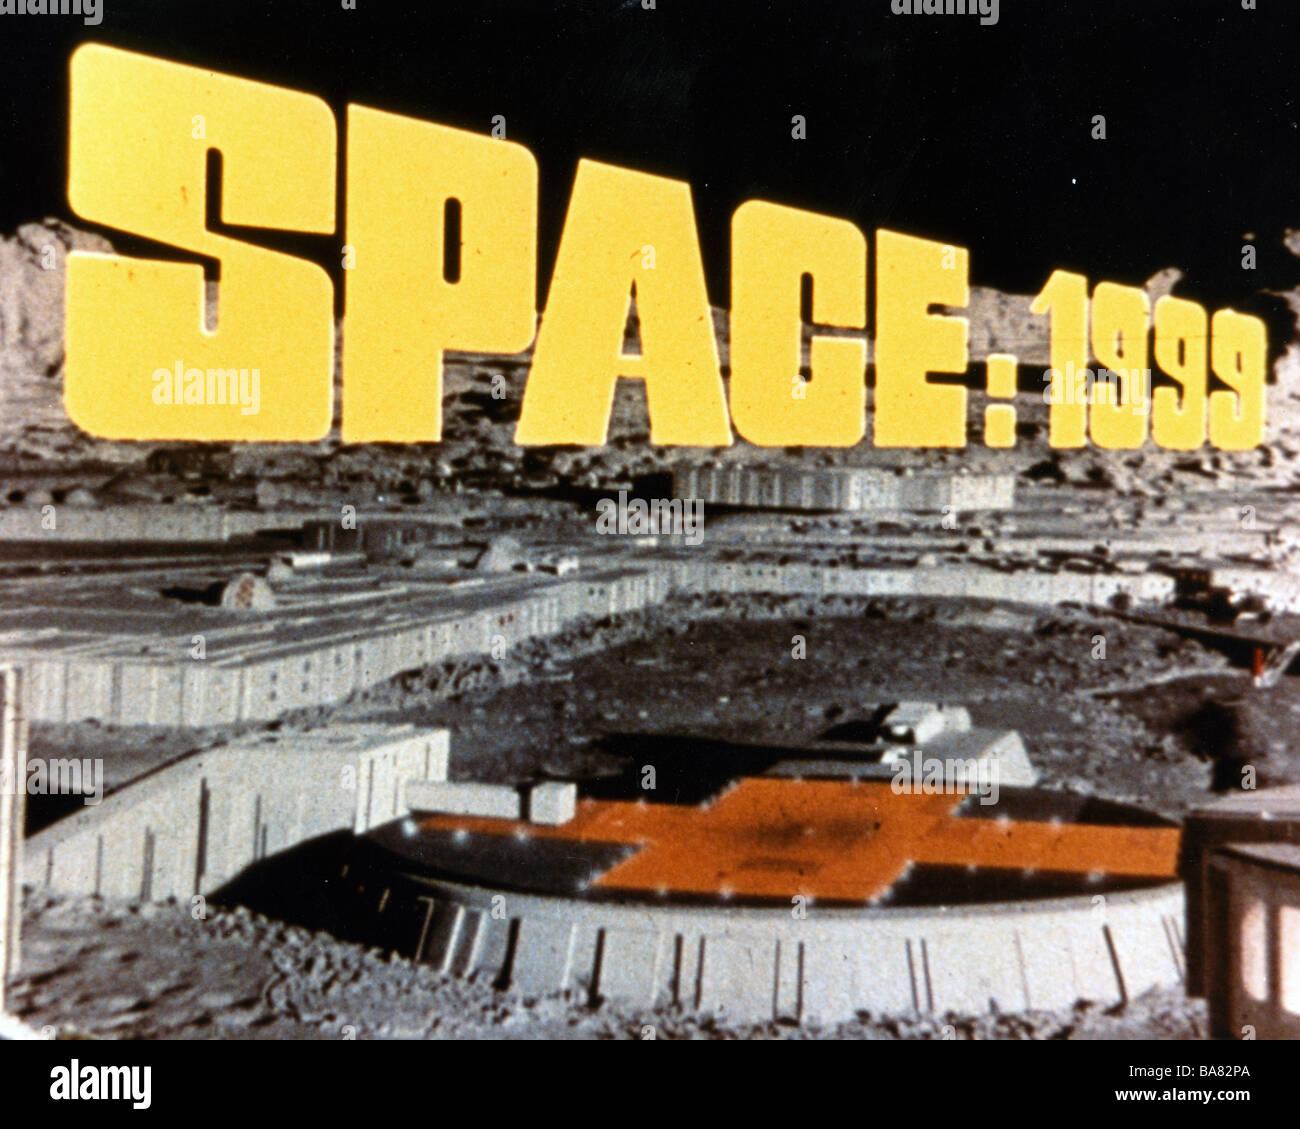 SPACE 1999  UK TV series - Stock Image